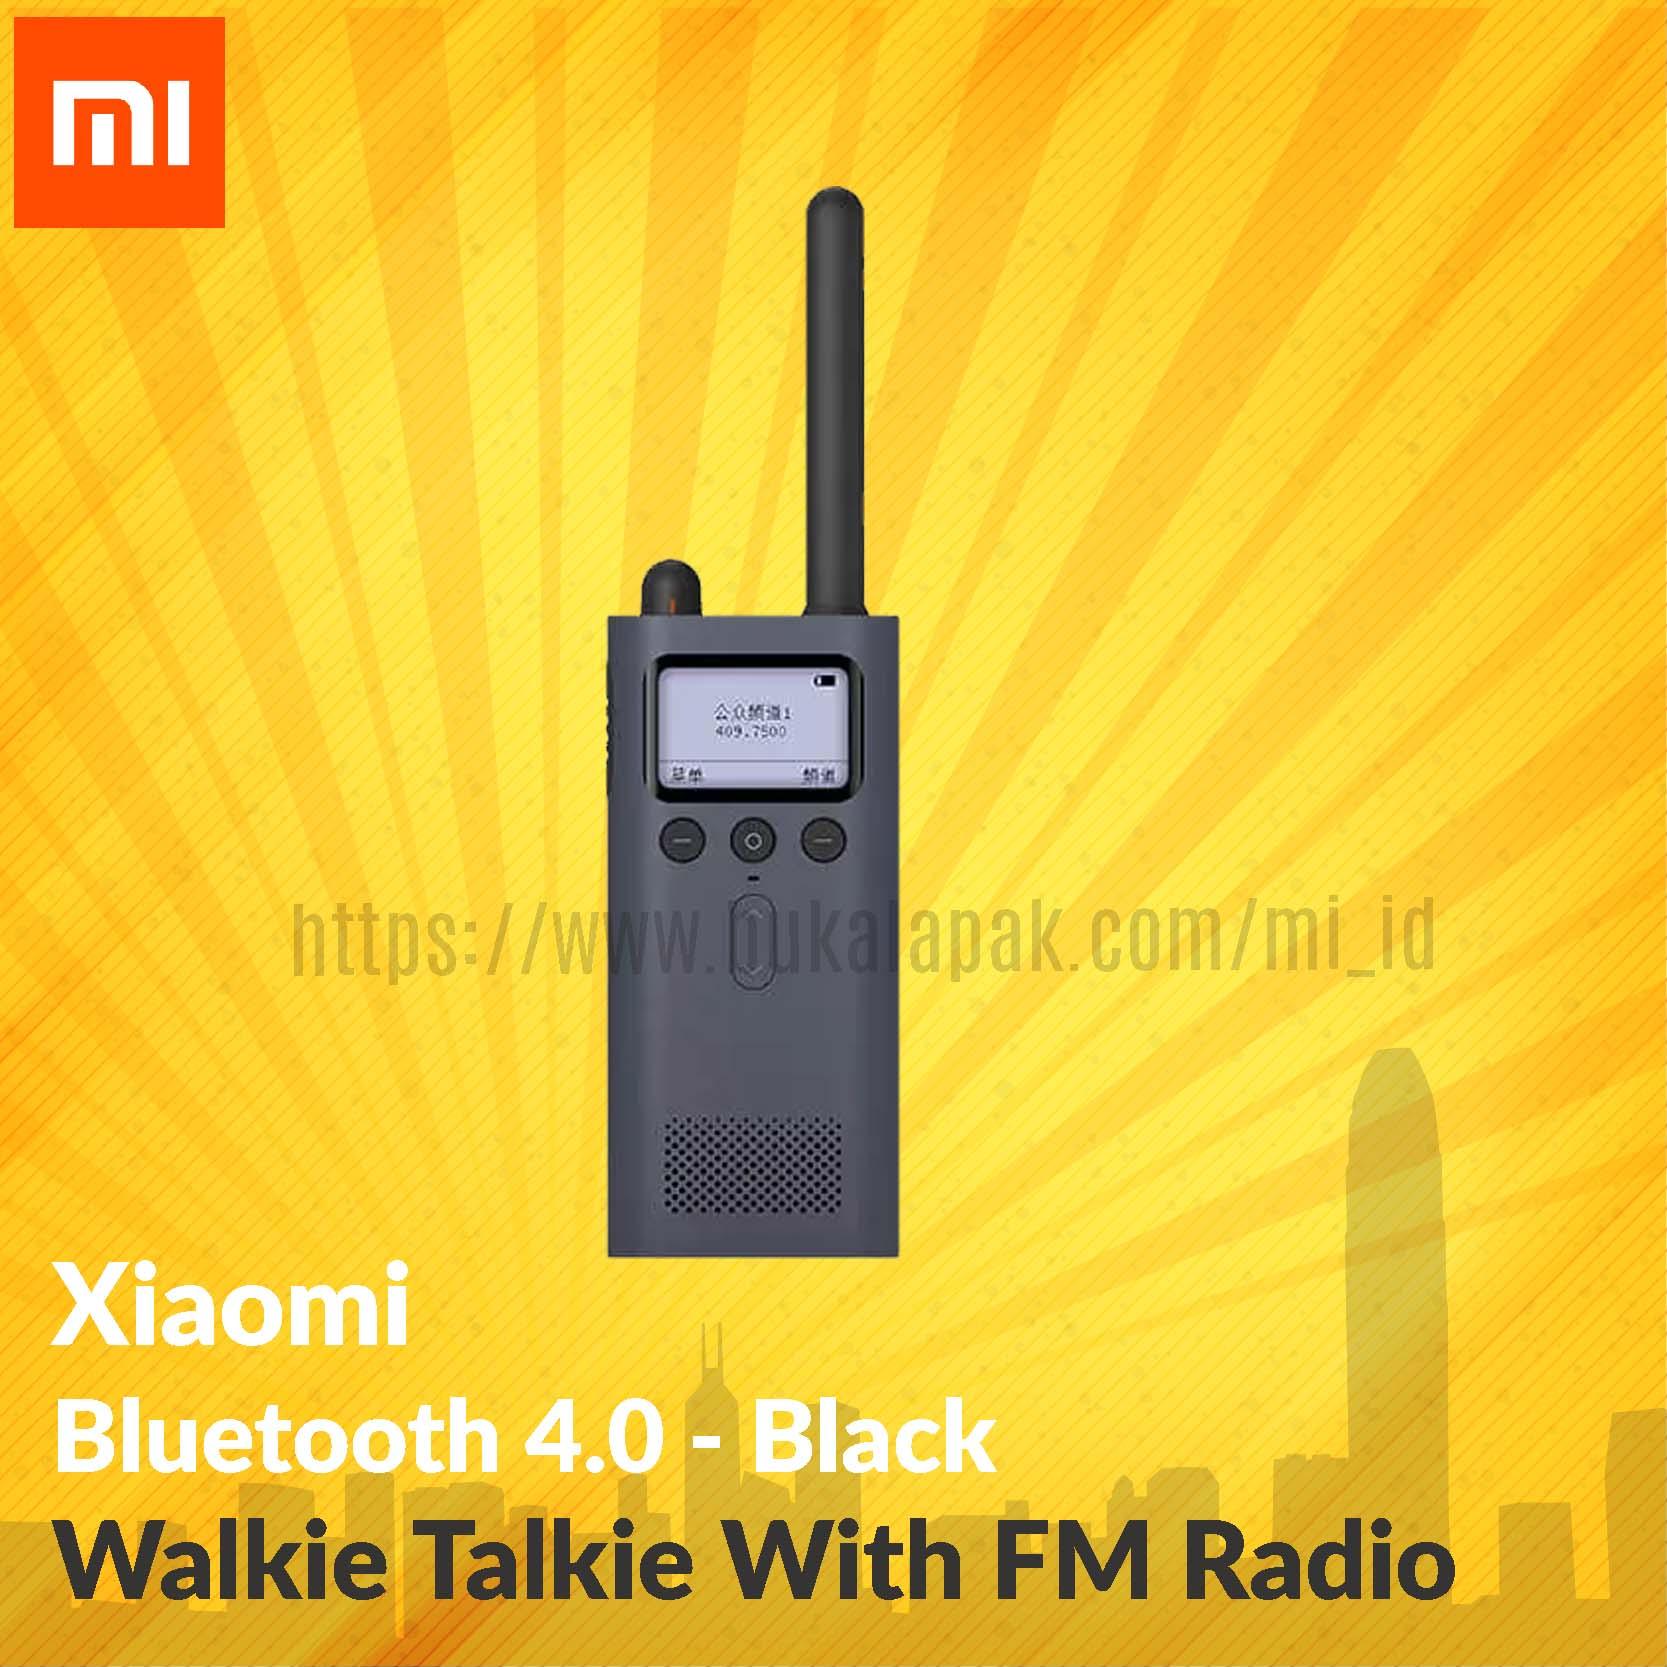 harga Xiaomi Bluetooth 4.0 Walkie Talkie With Fm Radio Blanja.com